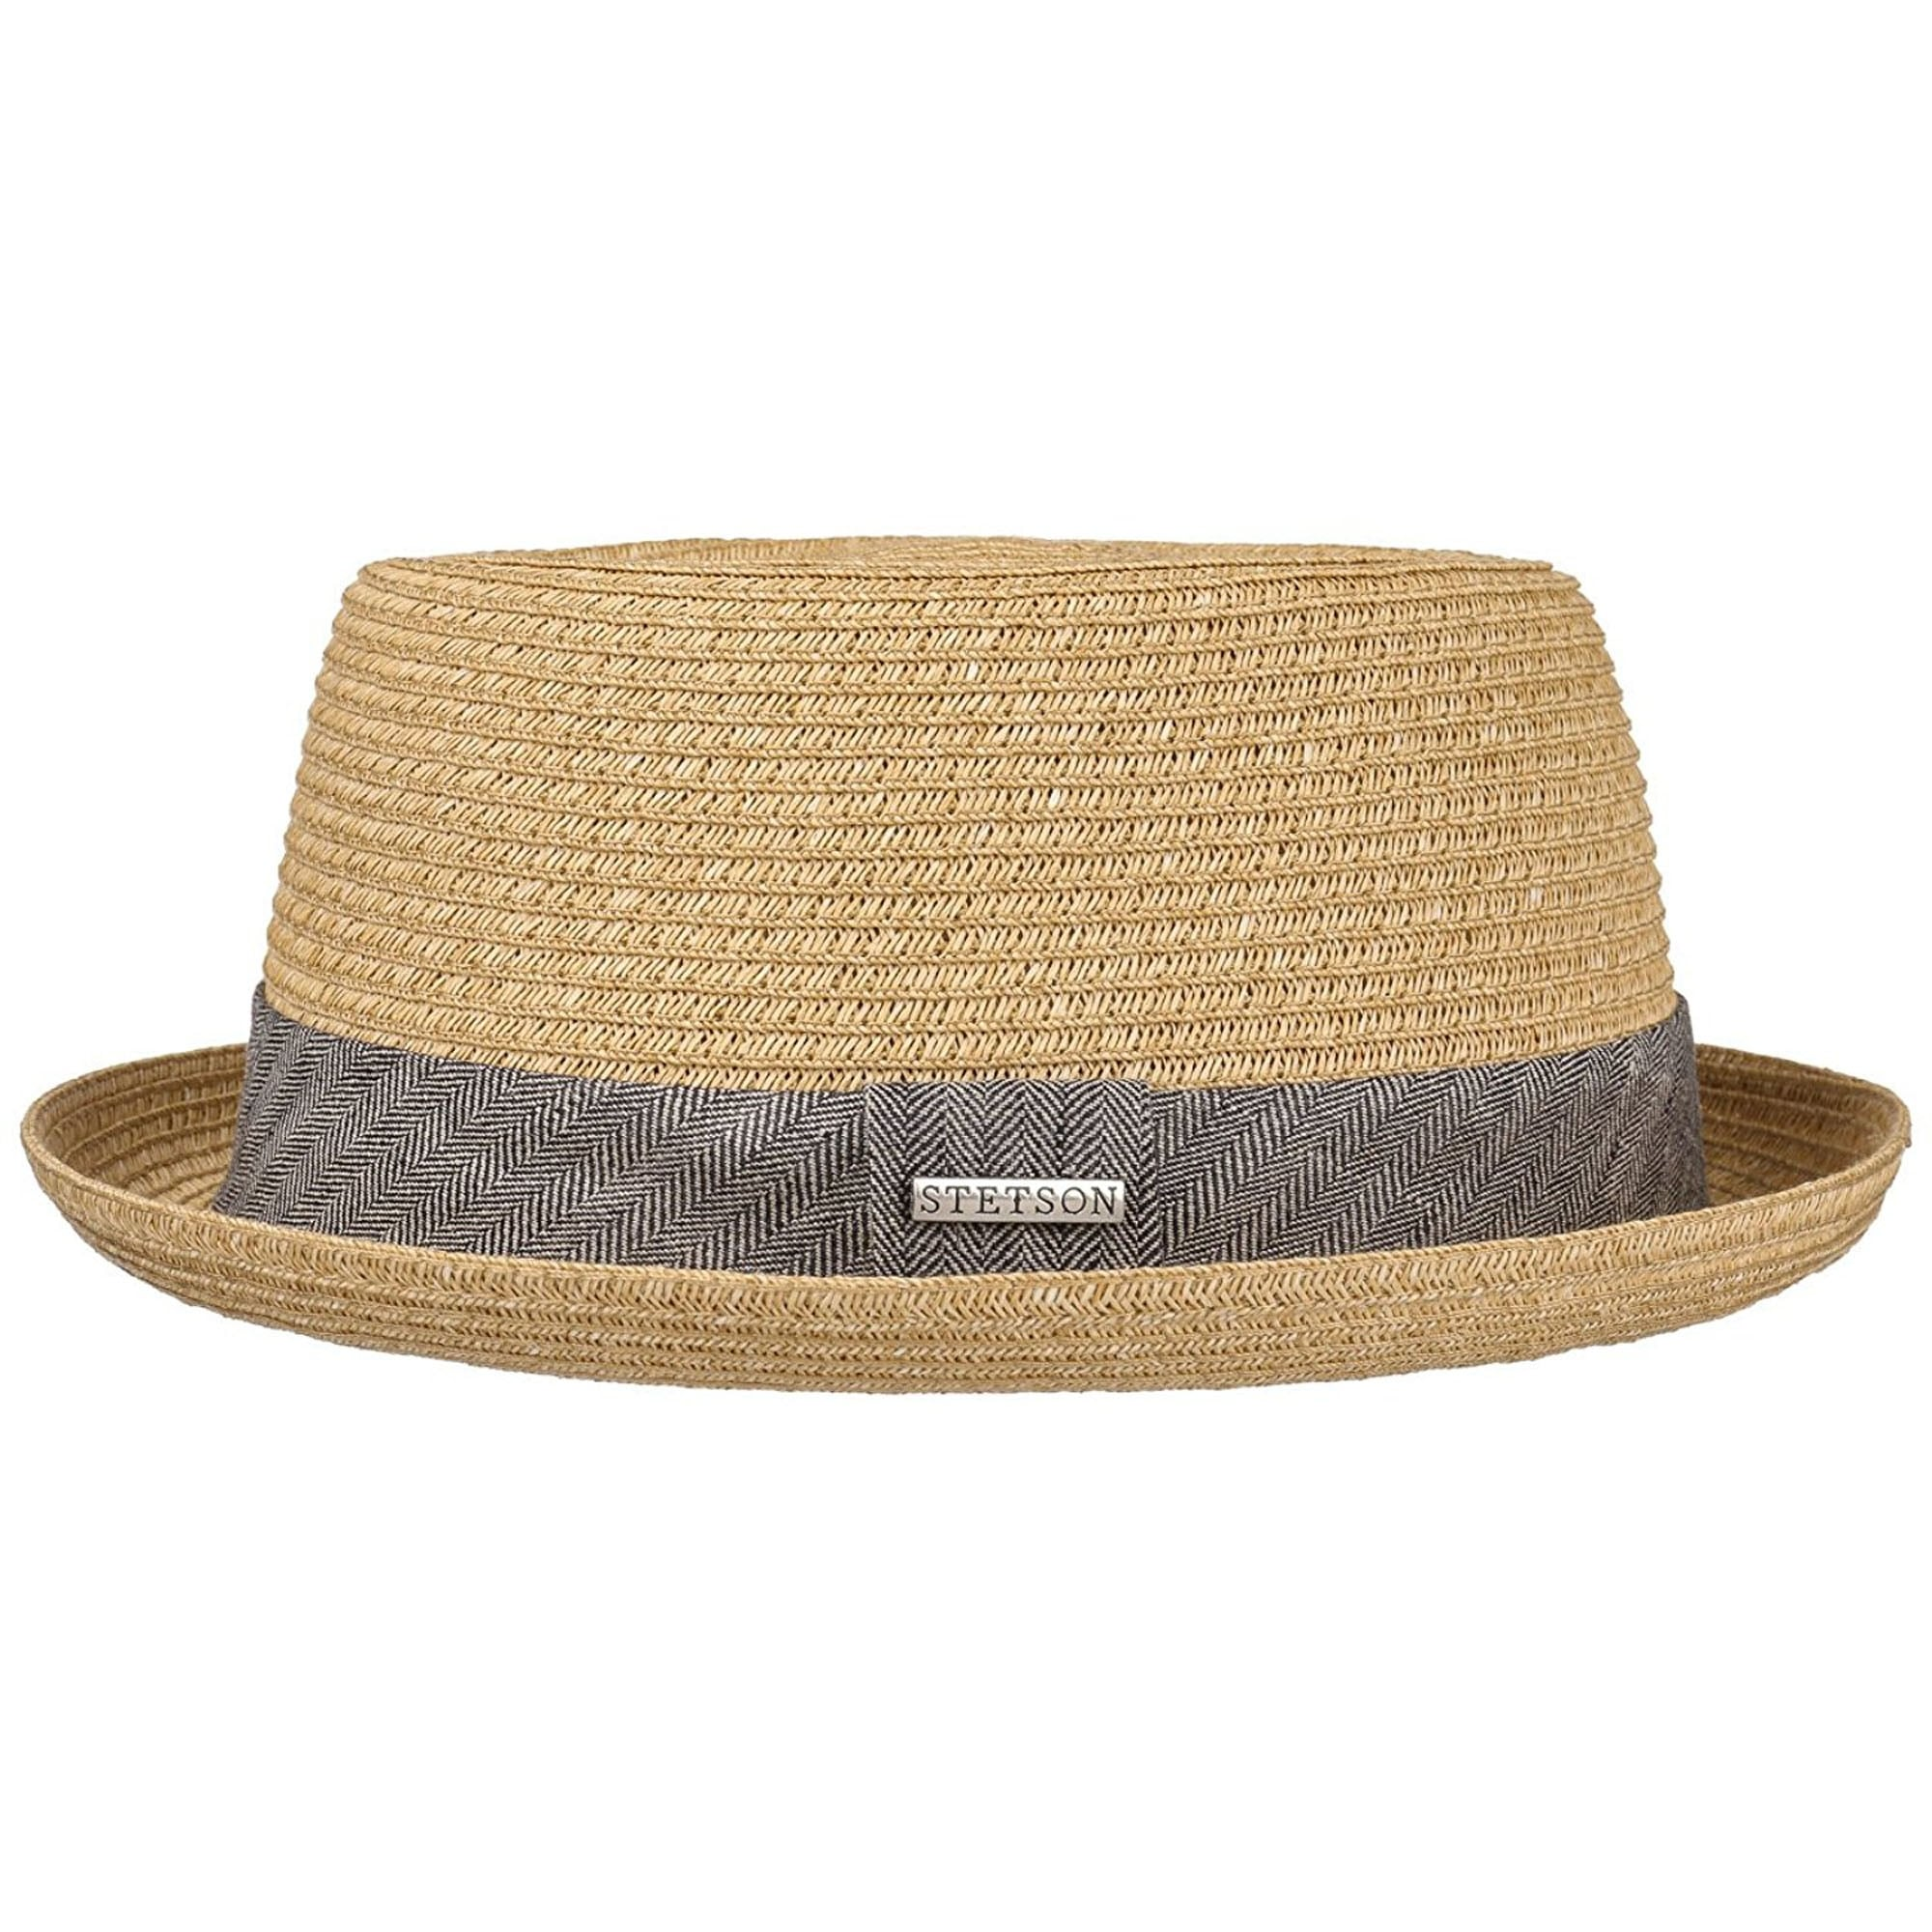 90c2e7c4 Stetson Hats Toyo Straw Trilby Hat | Stuarts London